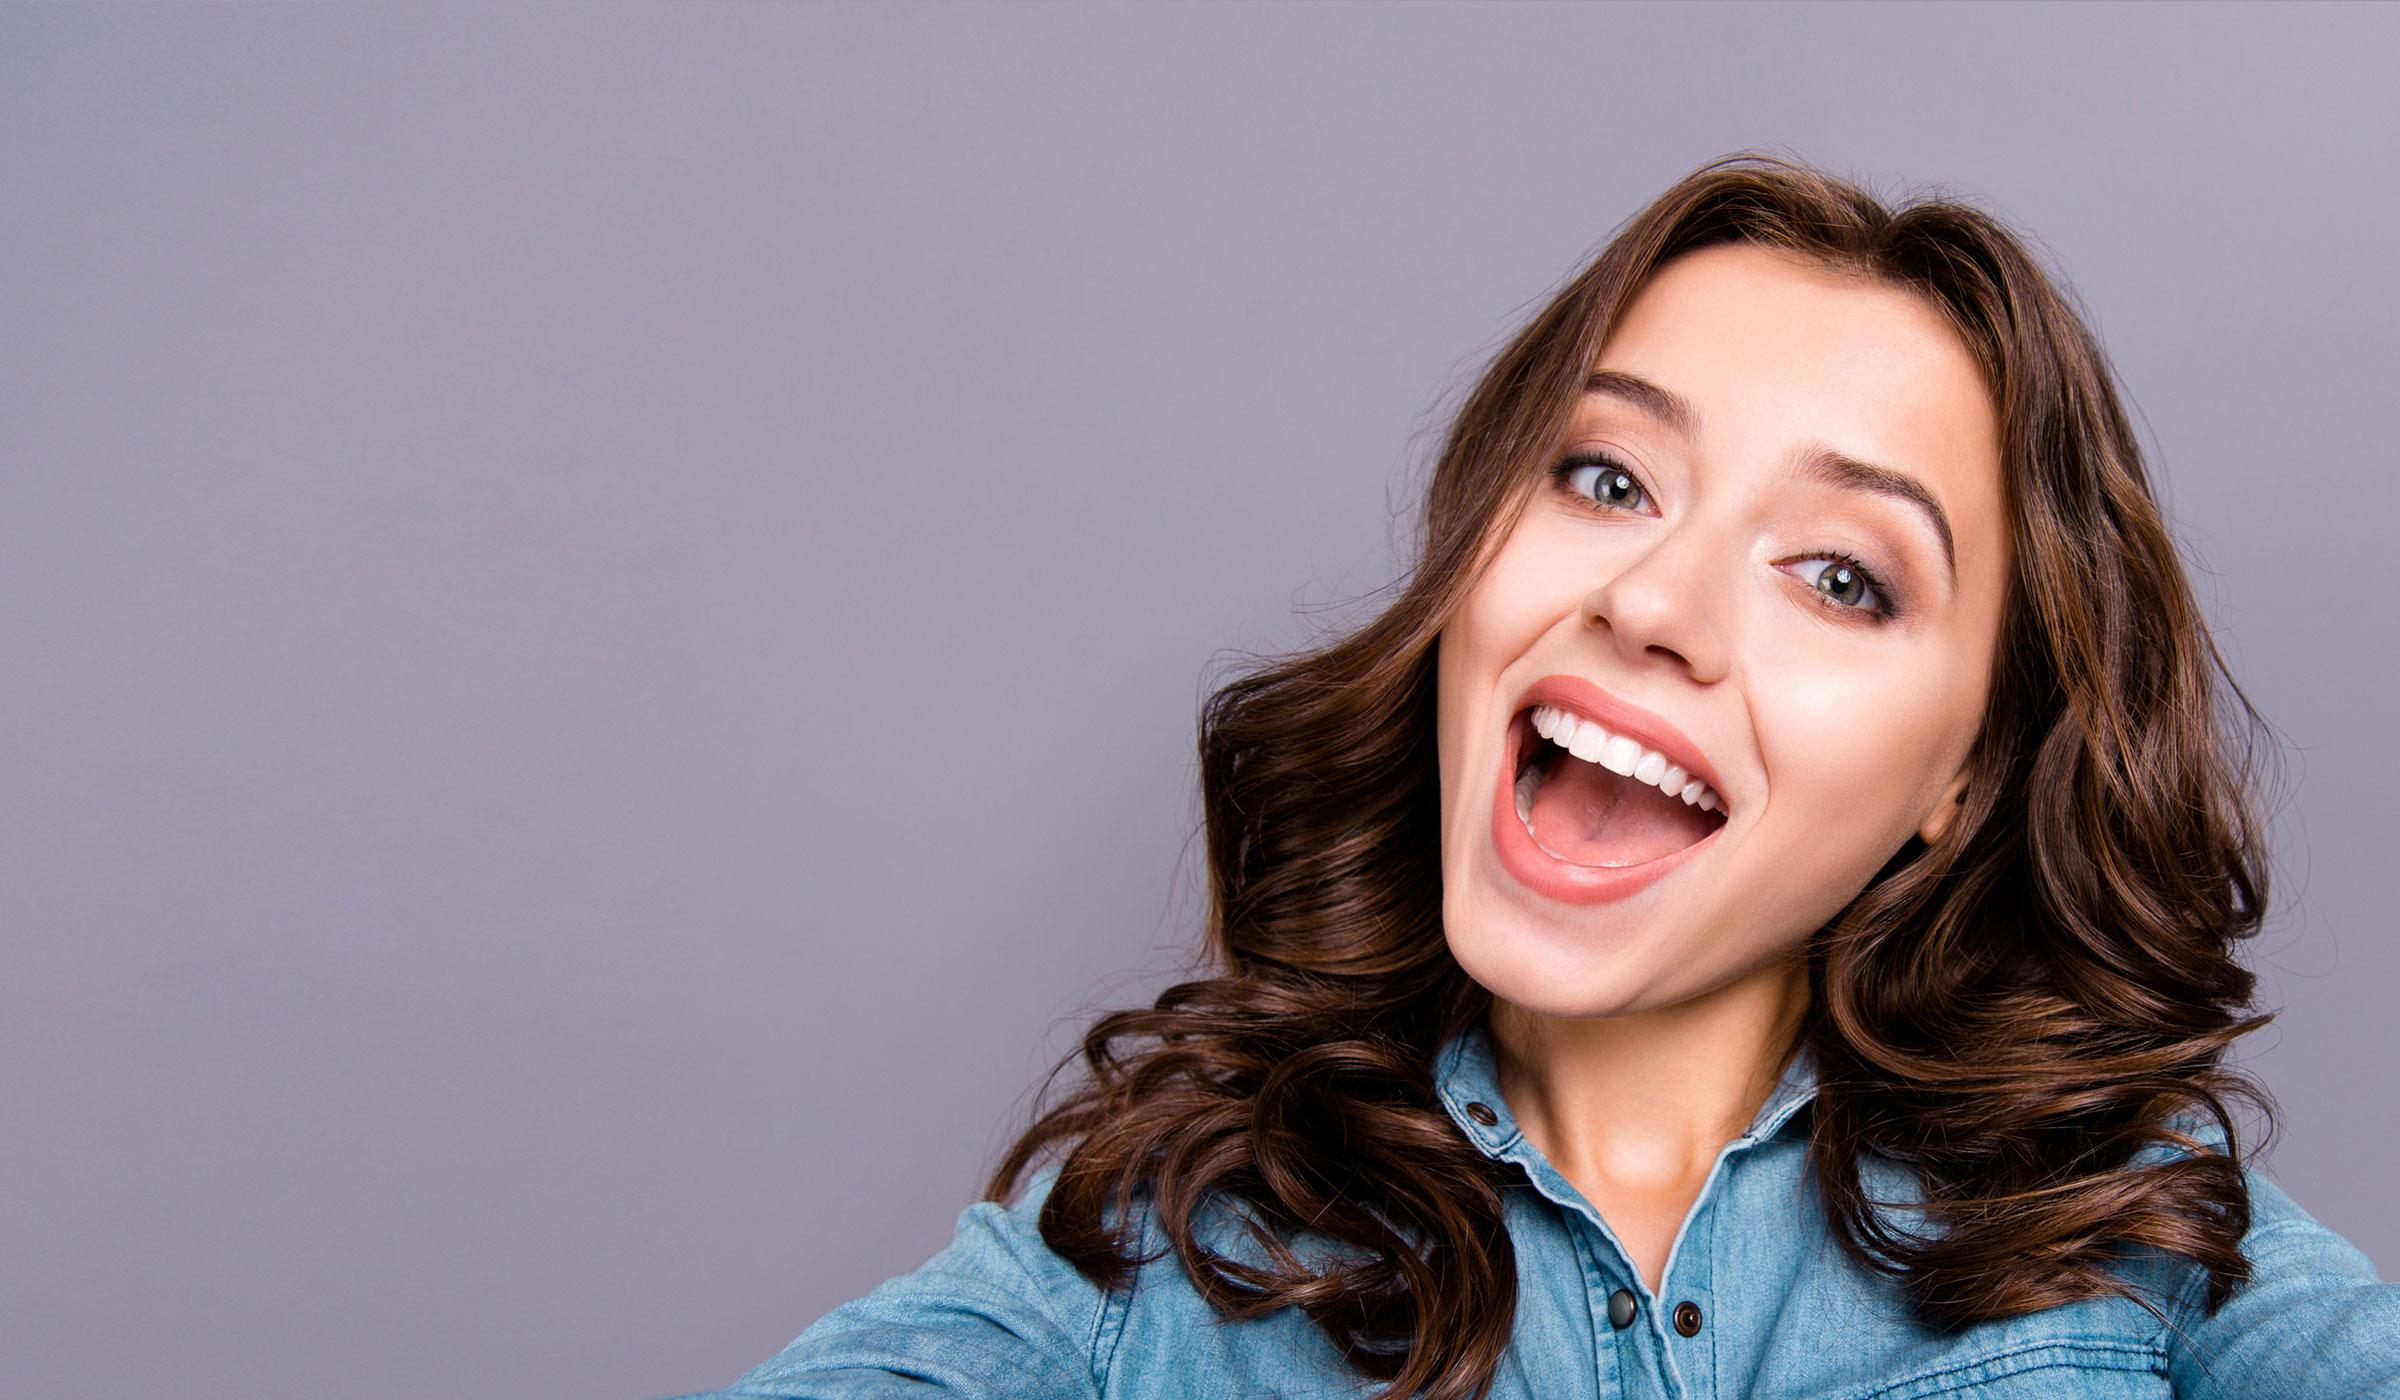 Teeth Whitening Solutions